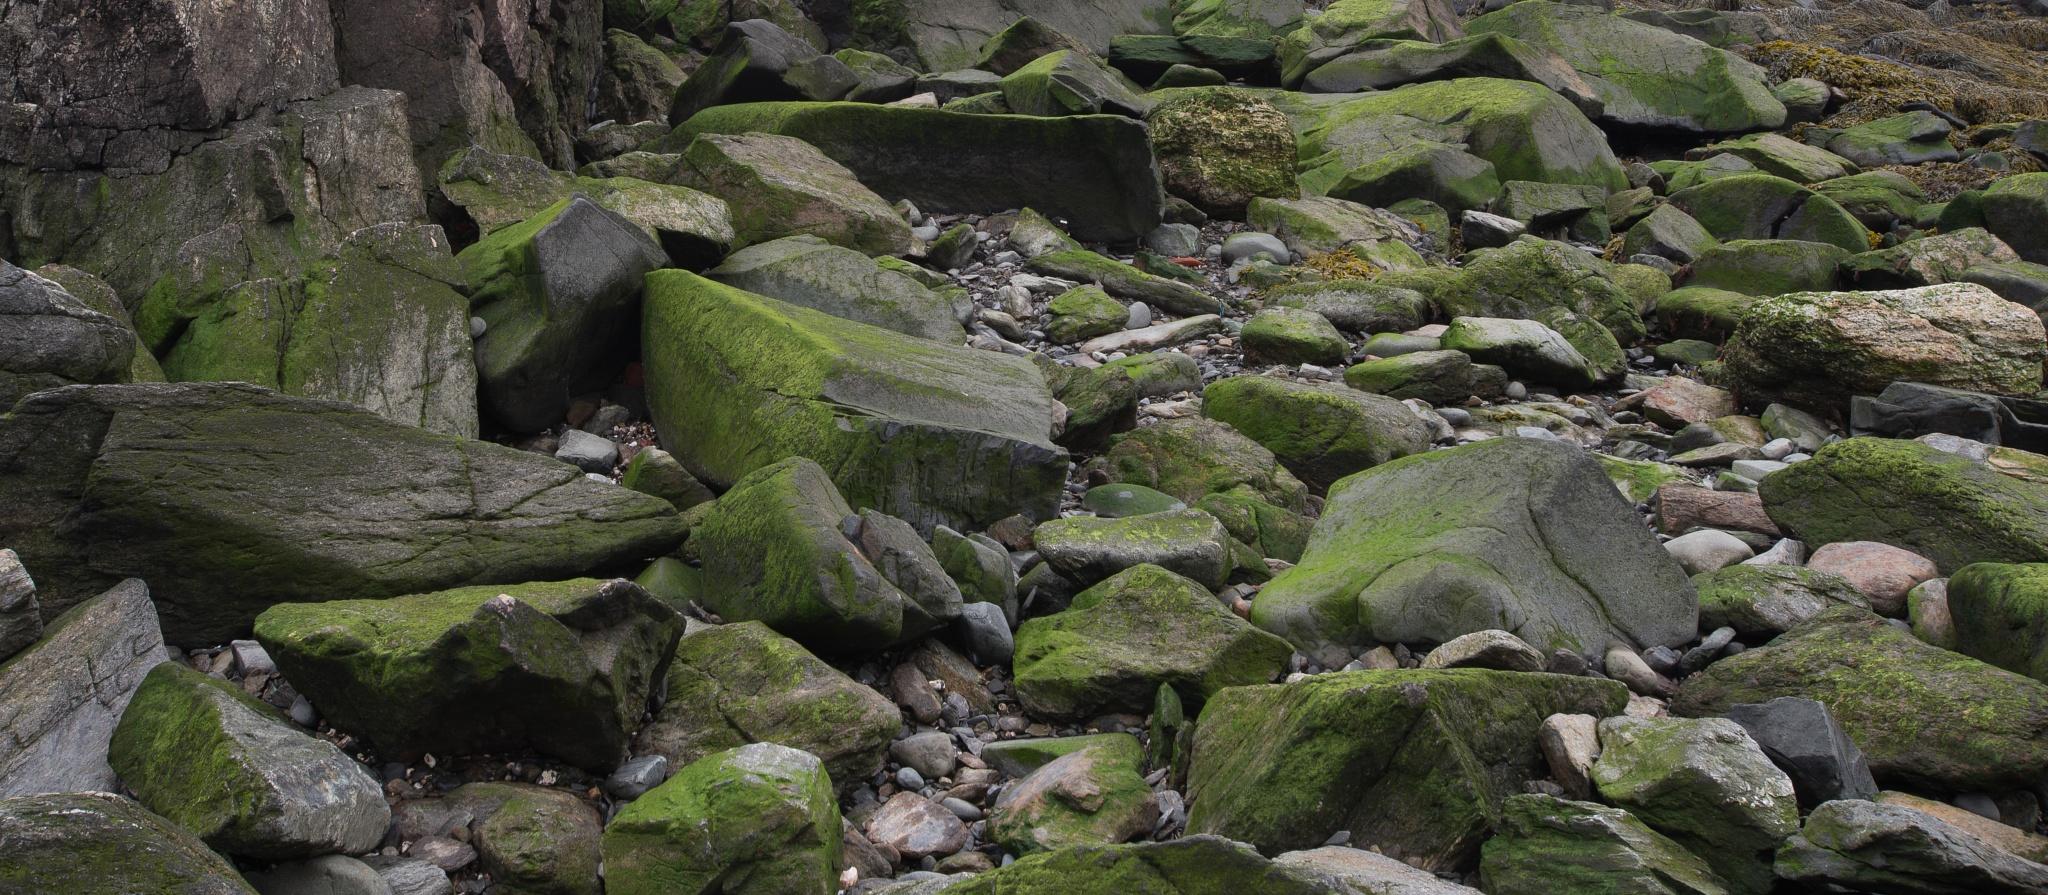 ...seacoast greens... by jamesmerecki